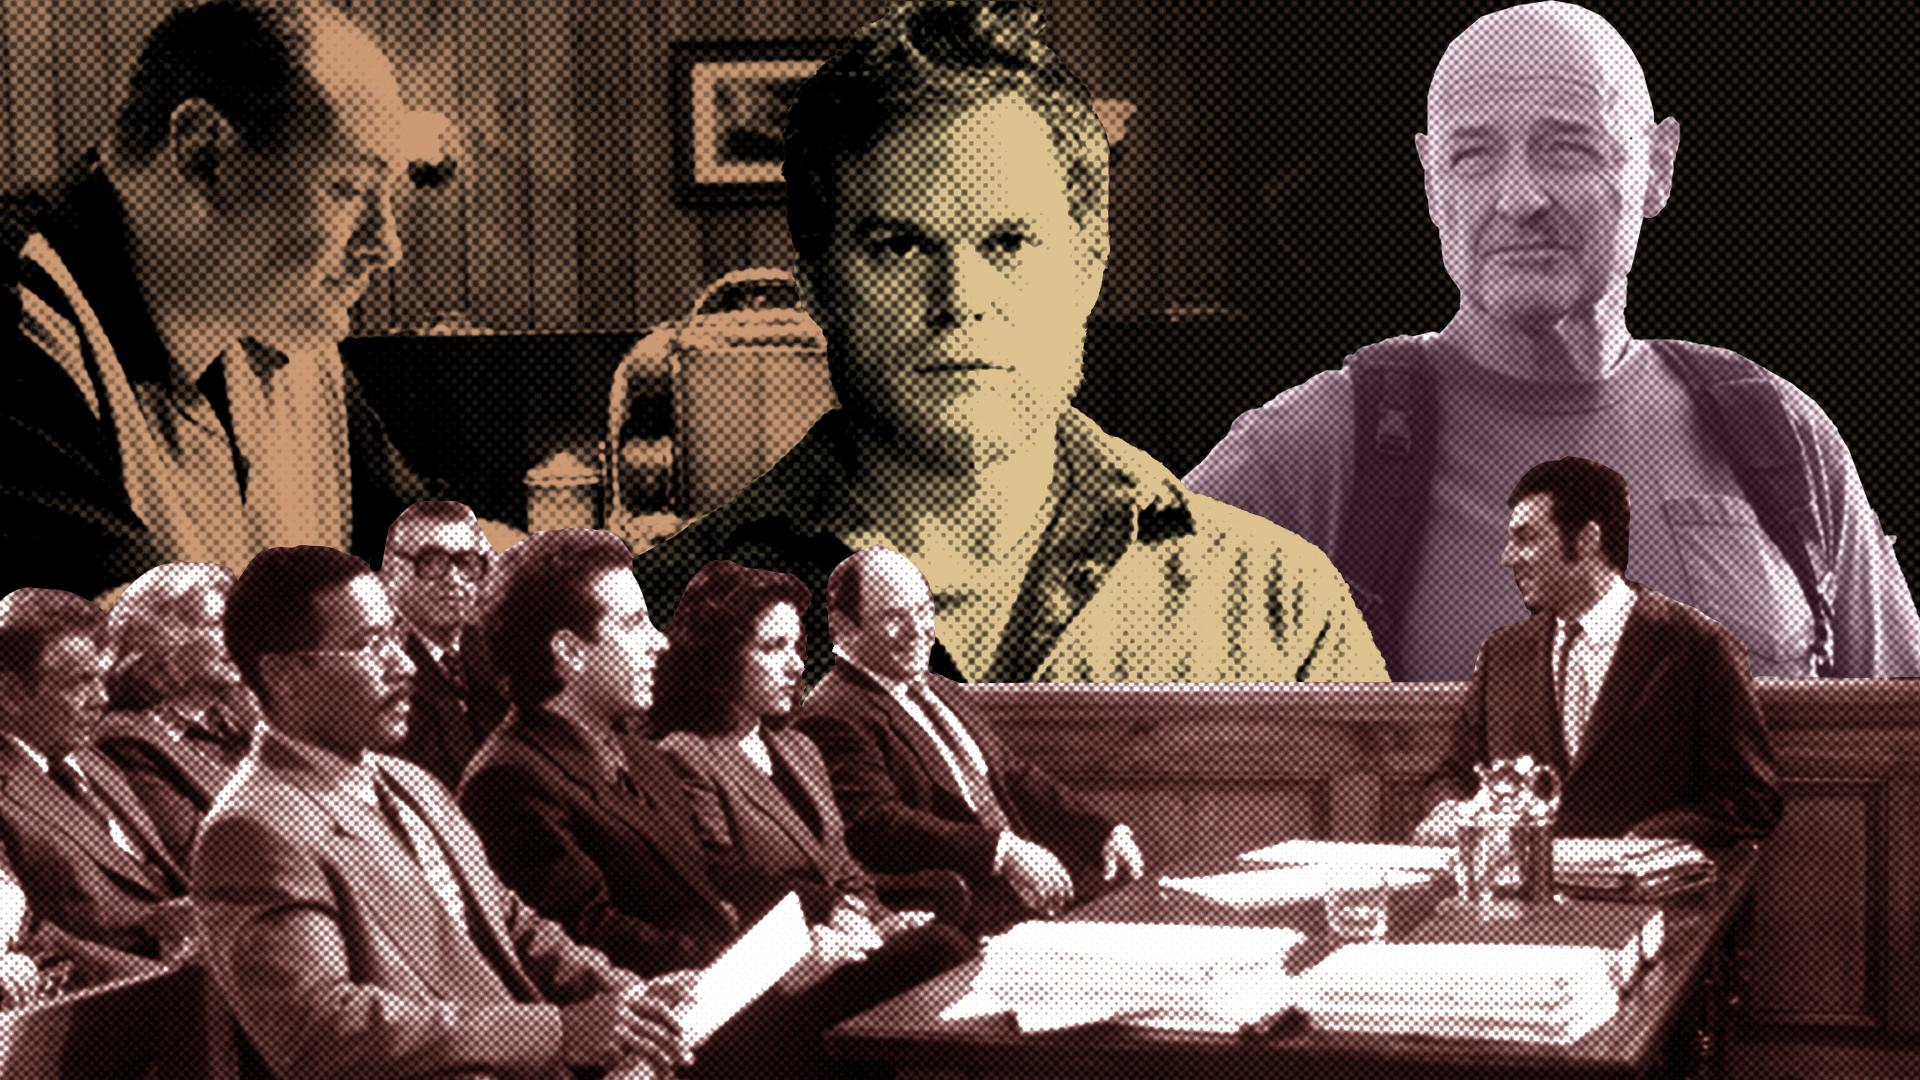 Controversial Series Finales, Seinfeld, Lost, Dexter, Sopranos